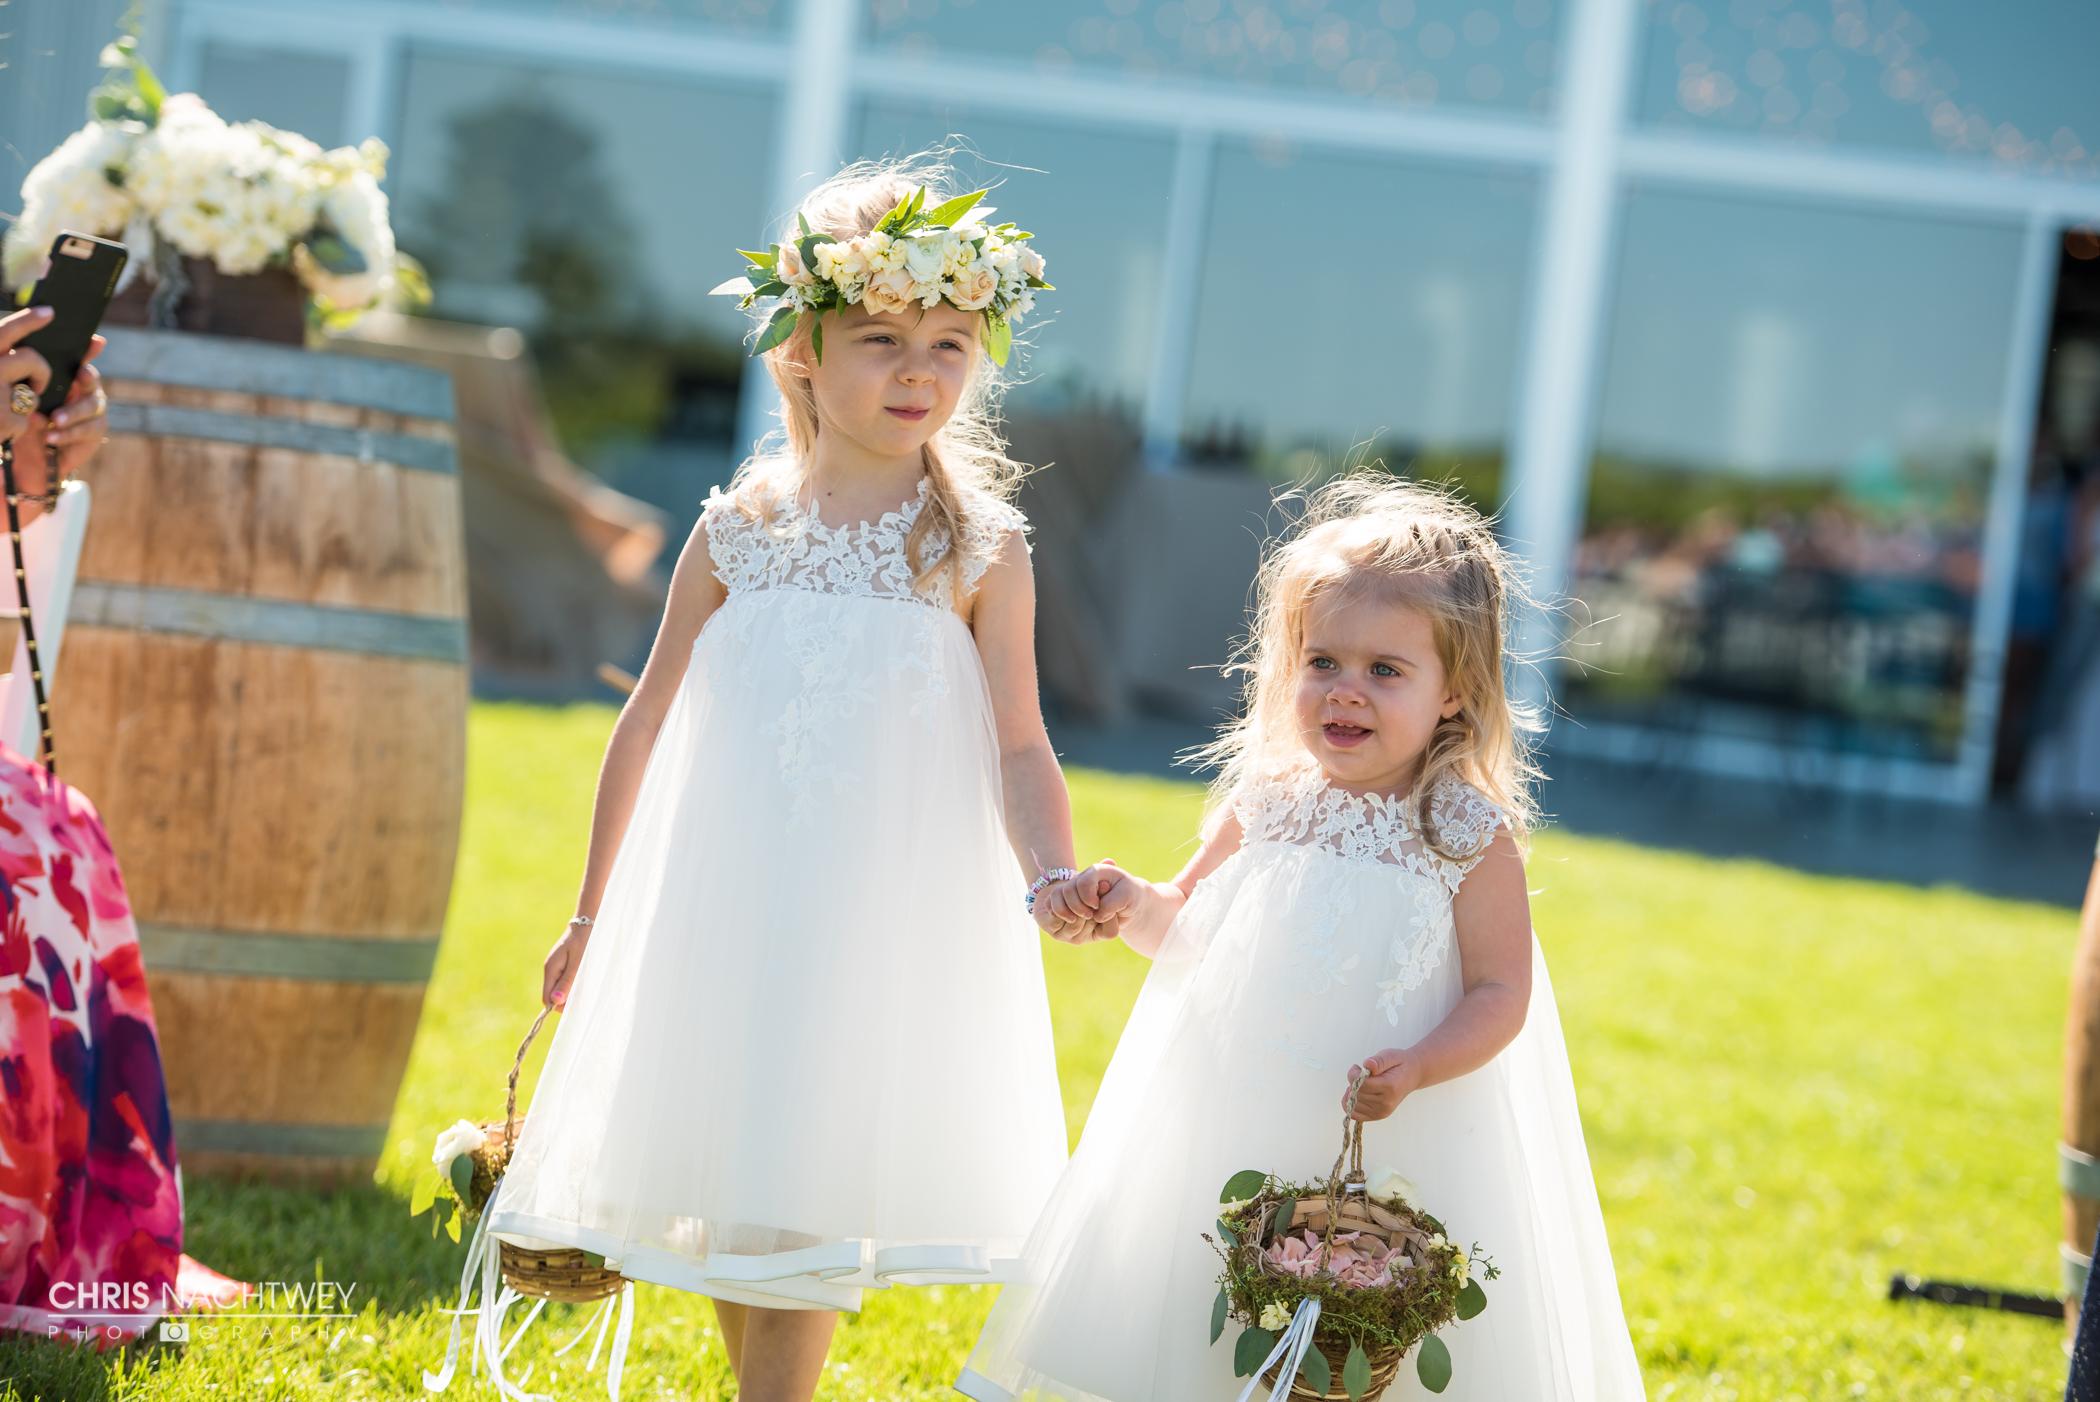 saltwater-farm-vineyard-wedding-photos-lindsay-gabe-chris-nachtwey-photography-2017-32.jpg